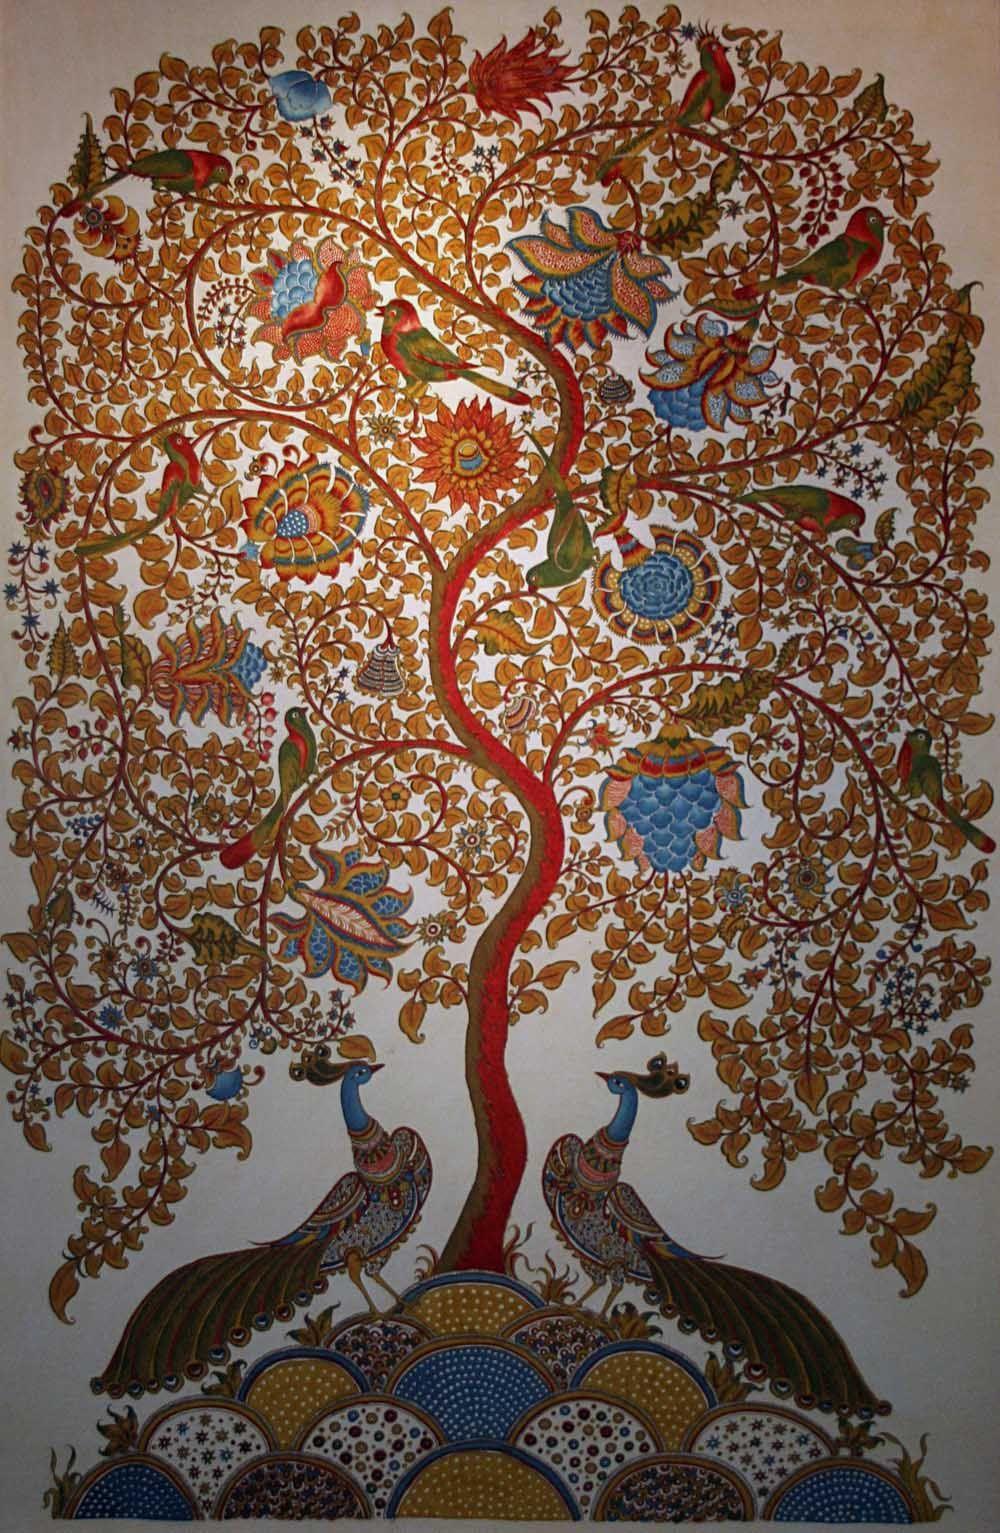 Tree of Life 'Kalamkari' painting. The 3000 yr old ancient